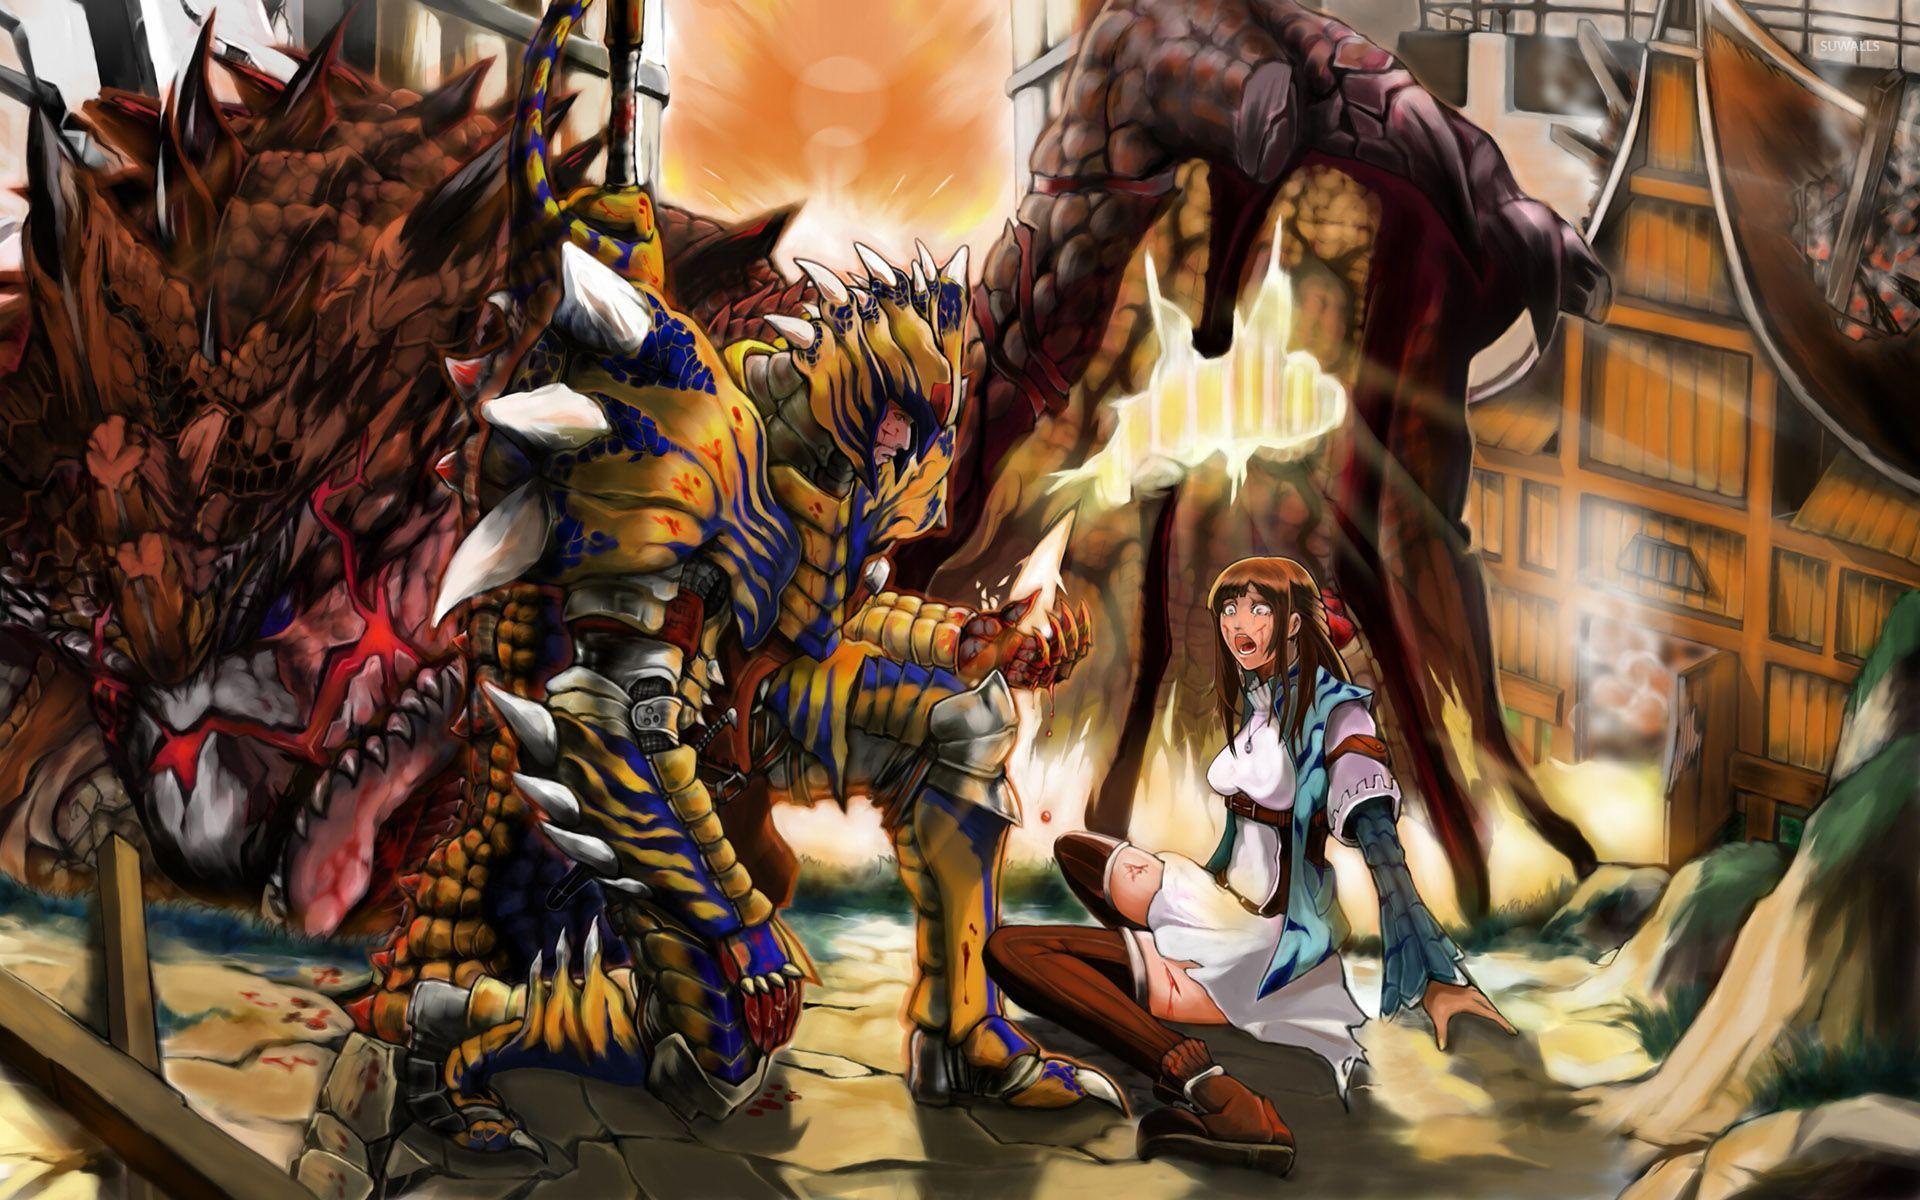 Free Download Monster Hunter Wallpaper Game Wallpapers 29271